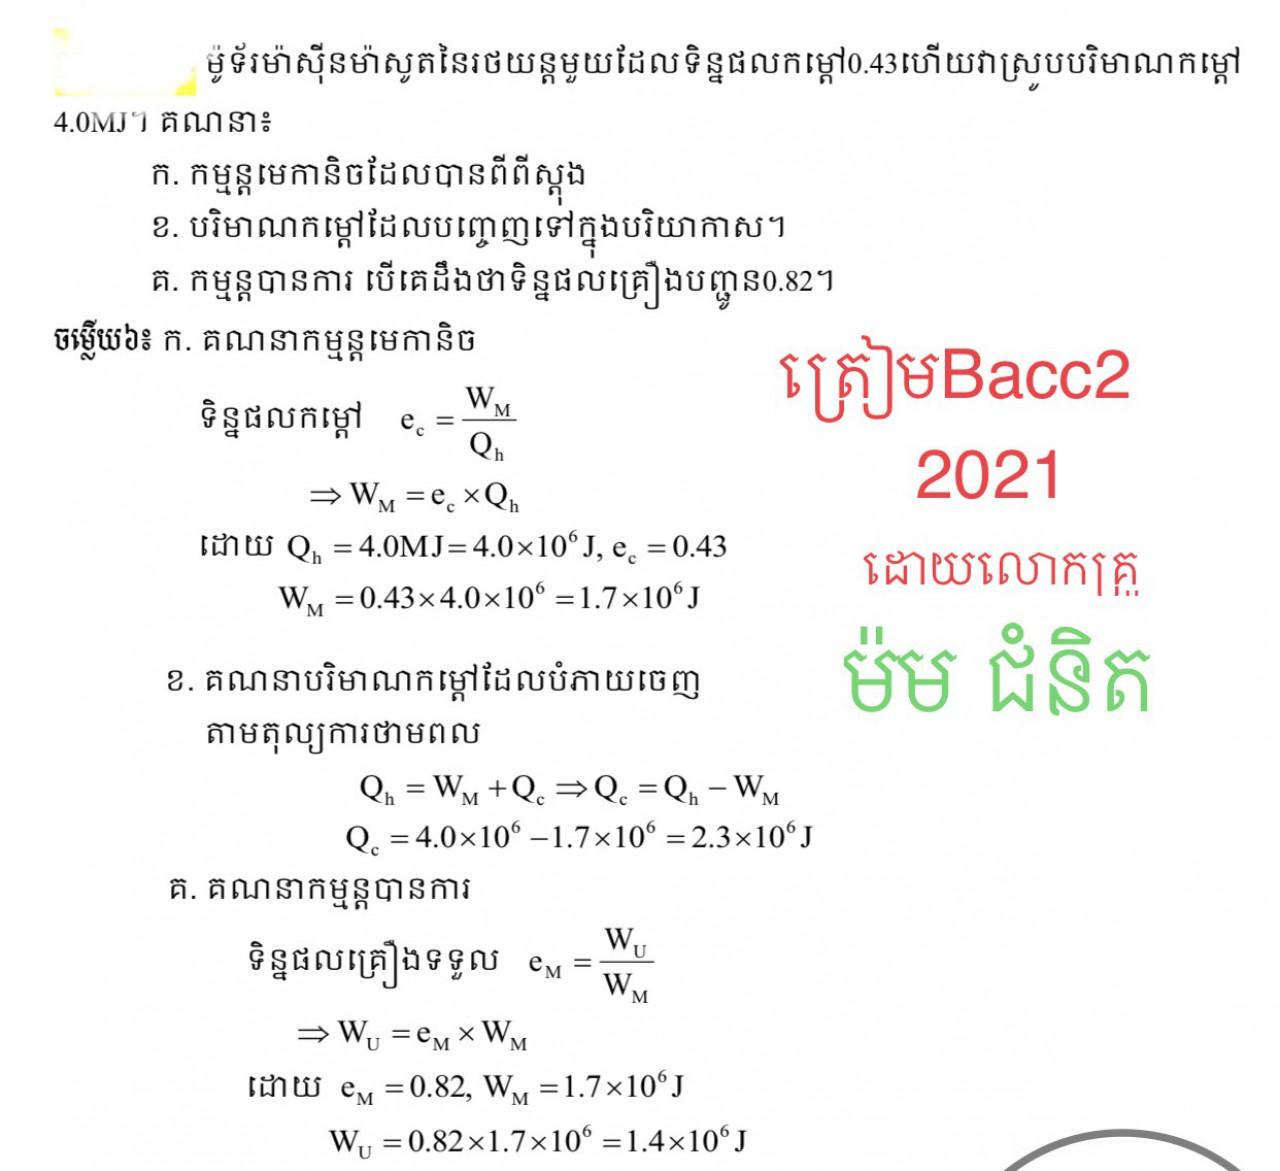 16BE4586-5EF6-4A5C-9CD9-F6366BE31C0F